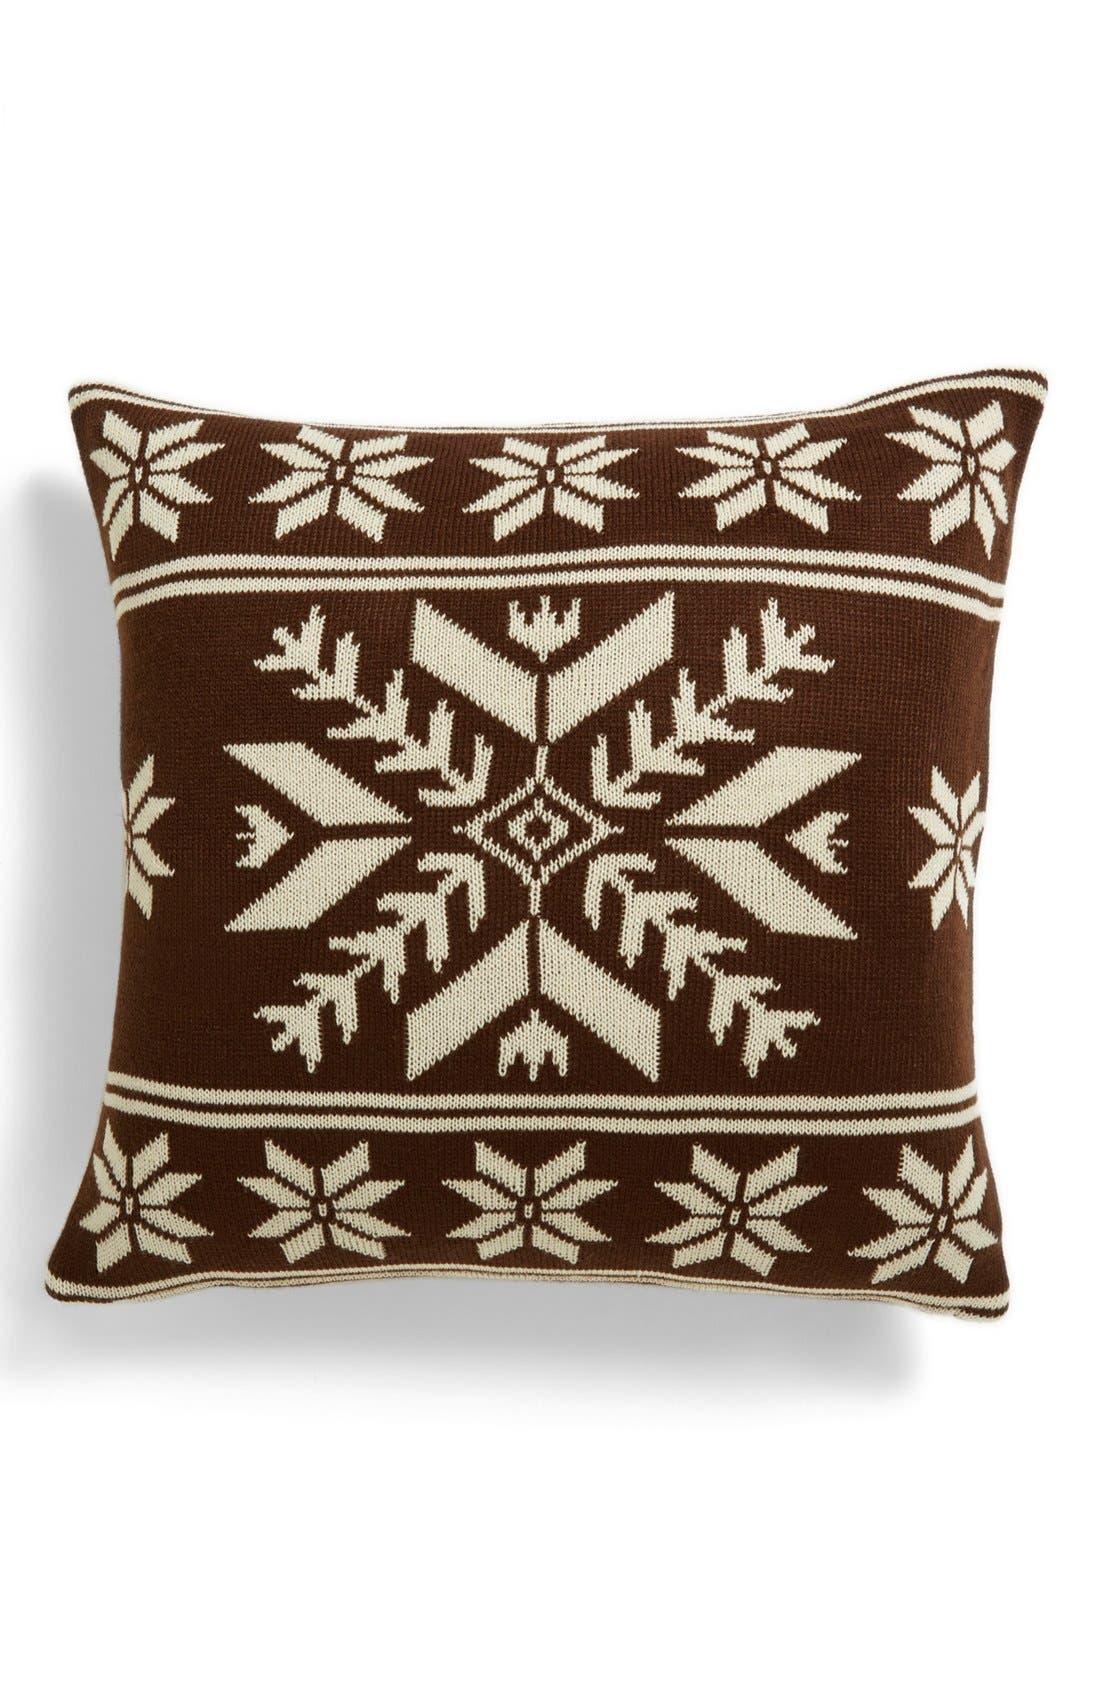 Alternate Image 1 Selected - Kennebunk Home 'Snowflake' Pillow